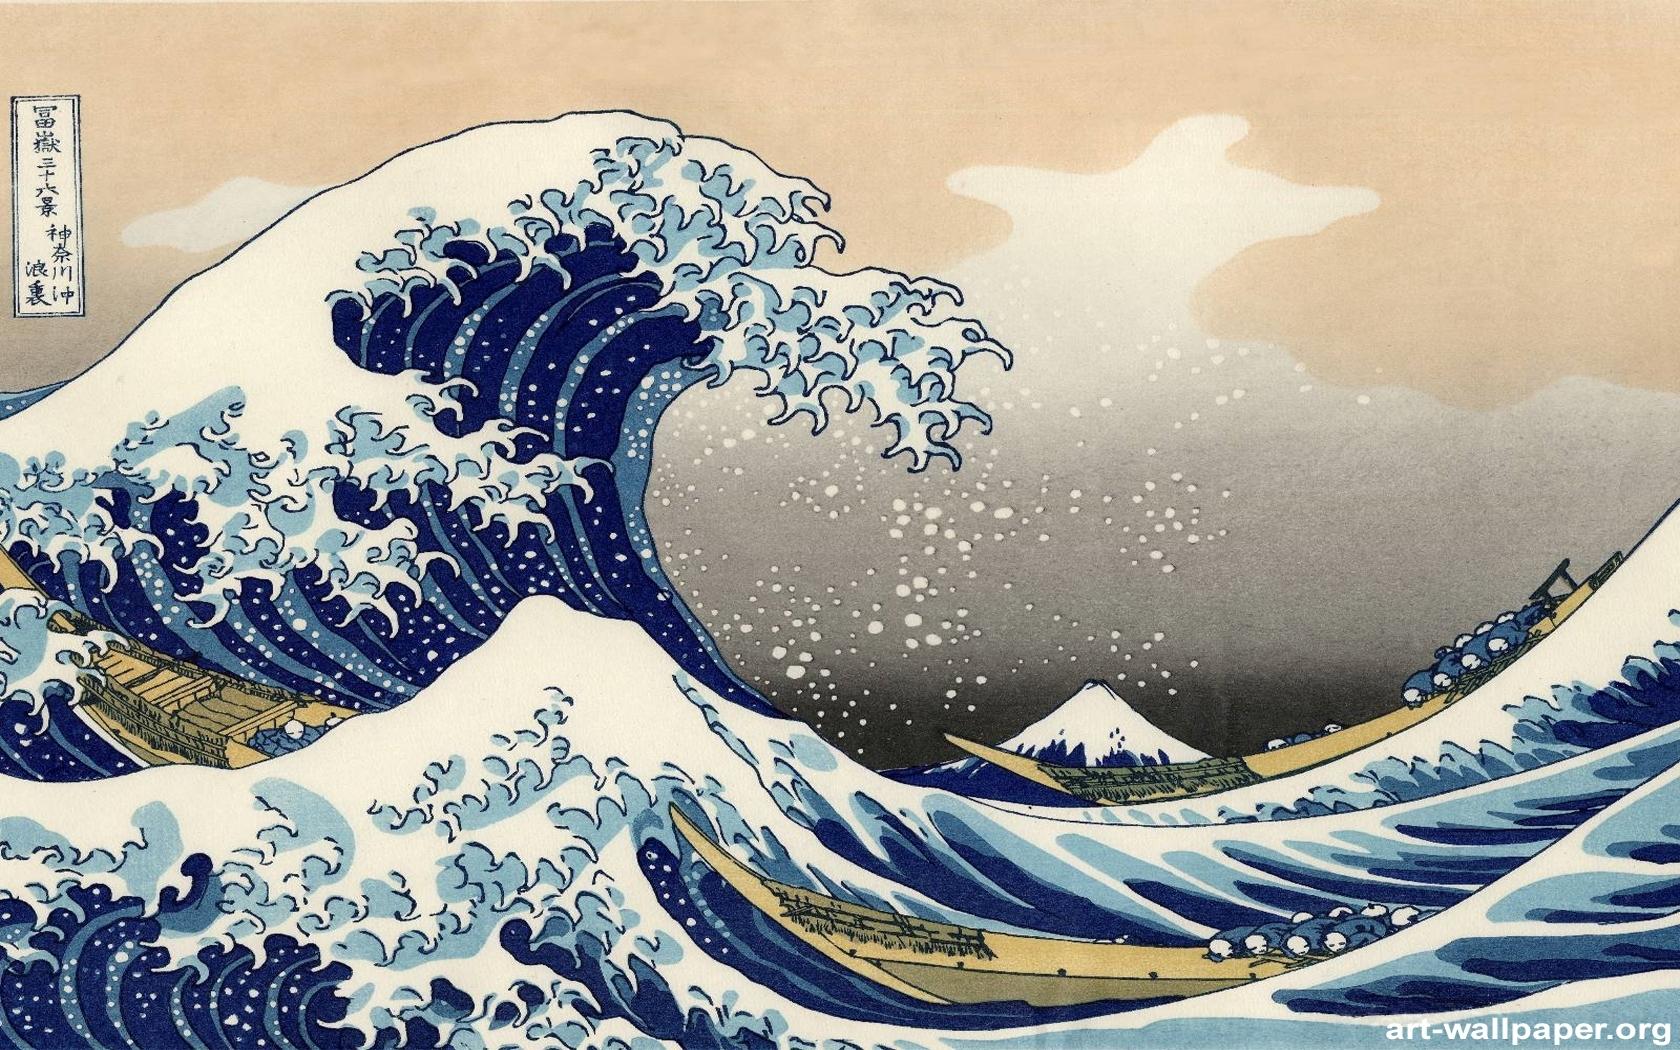 japanese art wallpapers, desktops, wallpaper